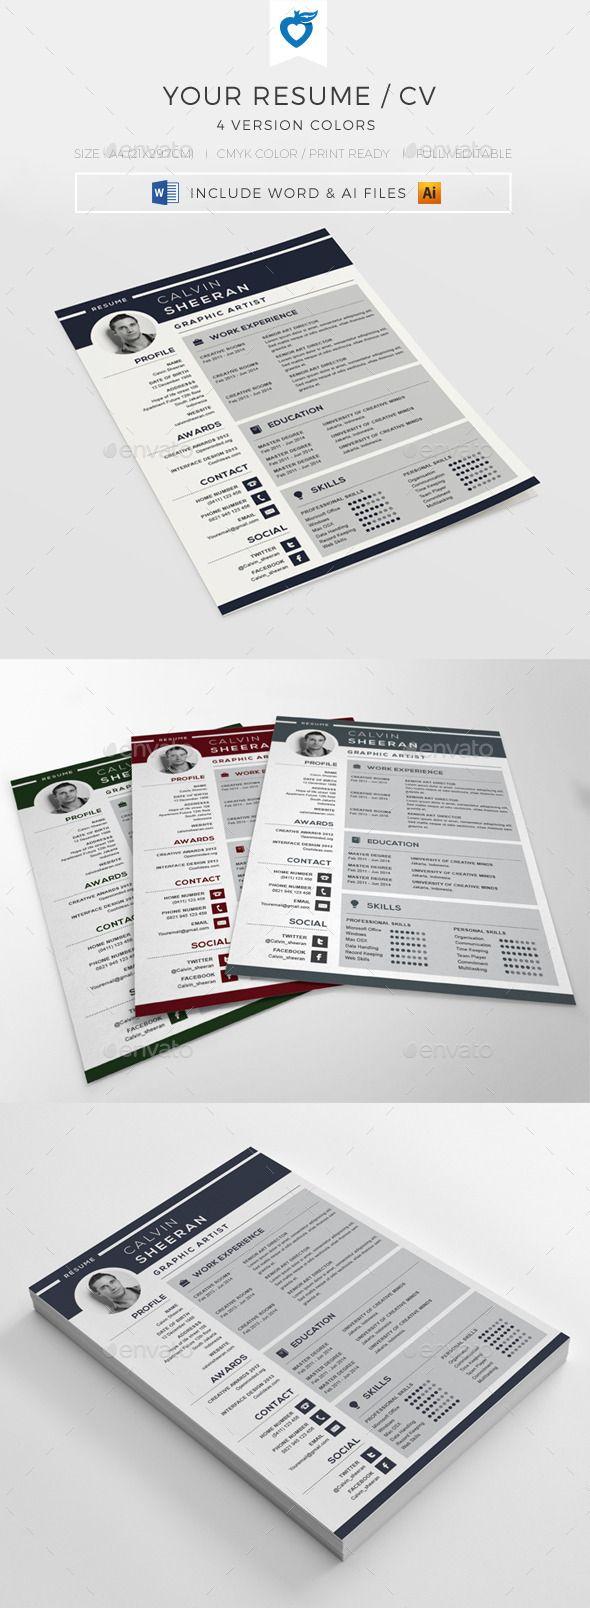 Best 25+ Cv structure ideas on Pinterest | Resume structure, Best ...